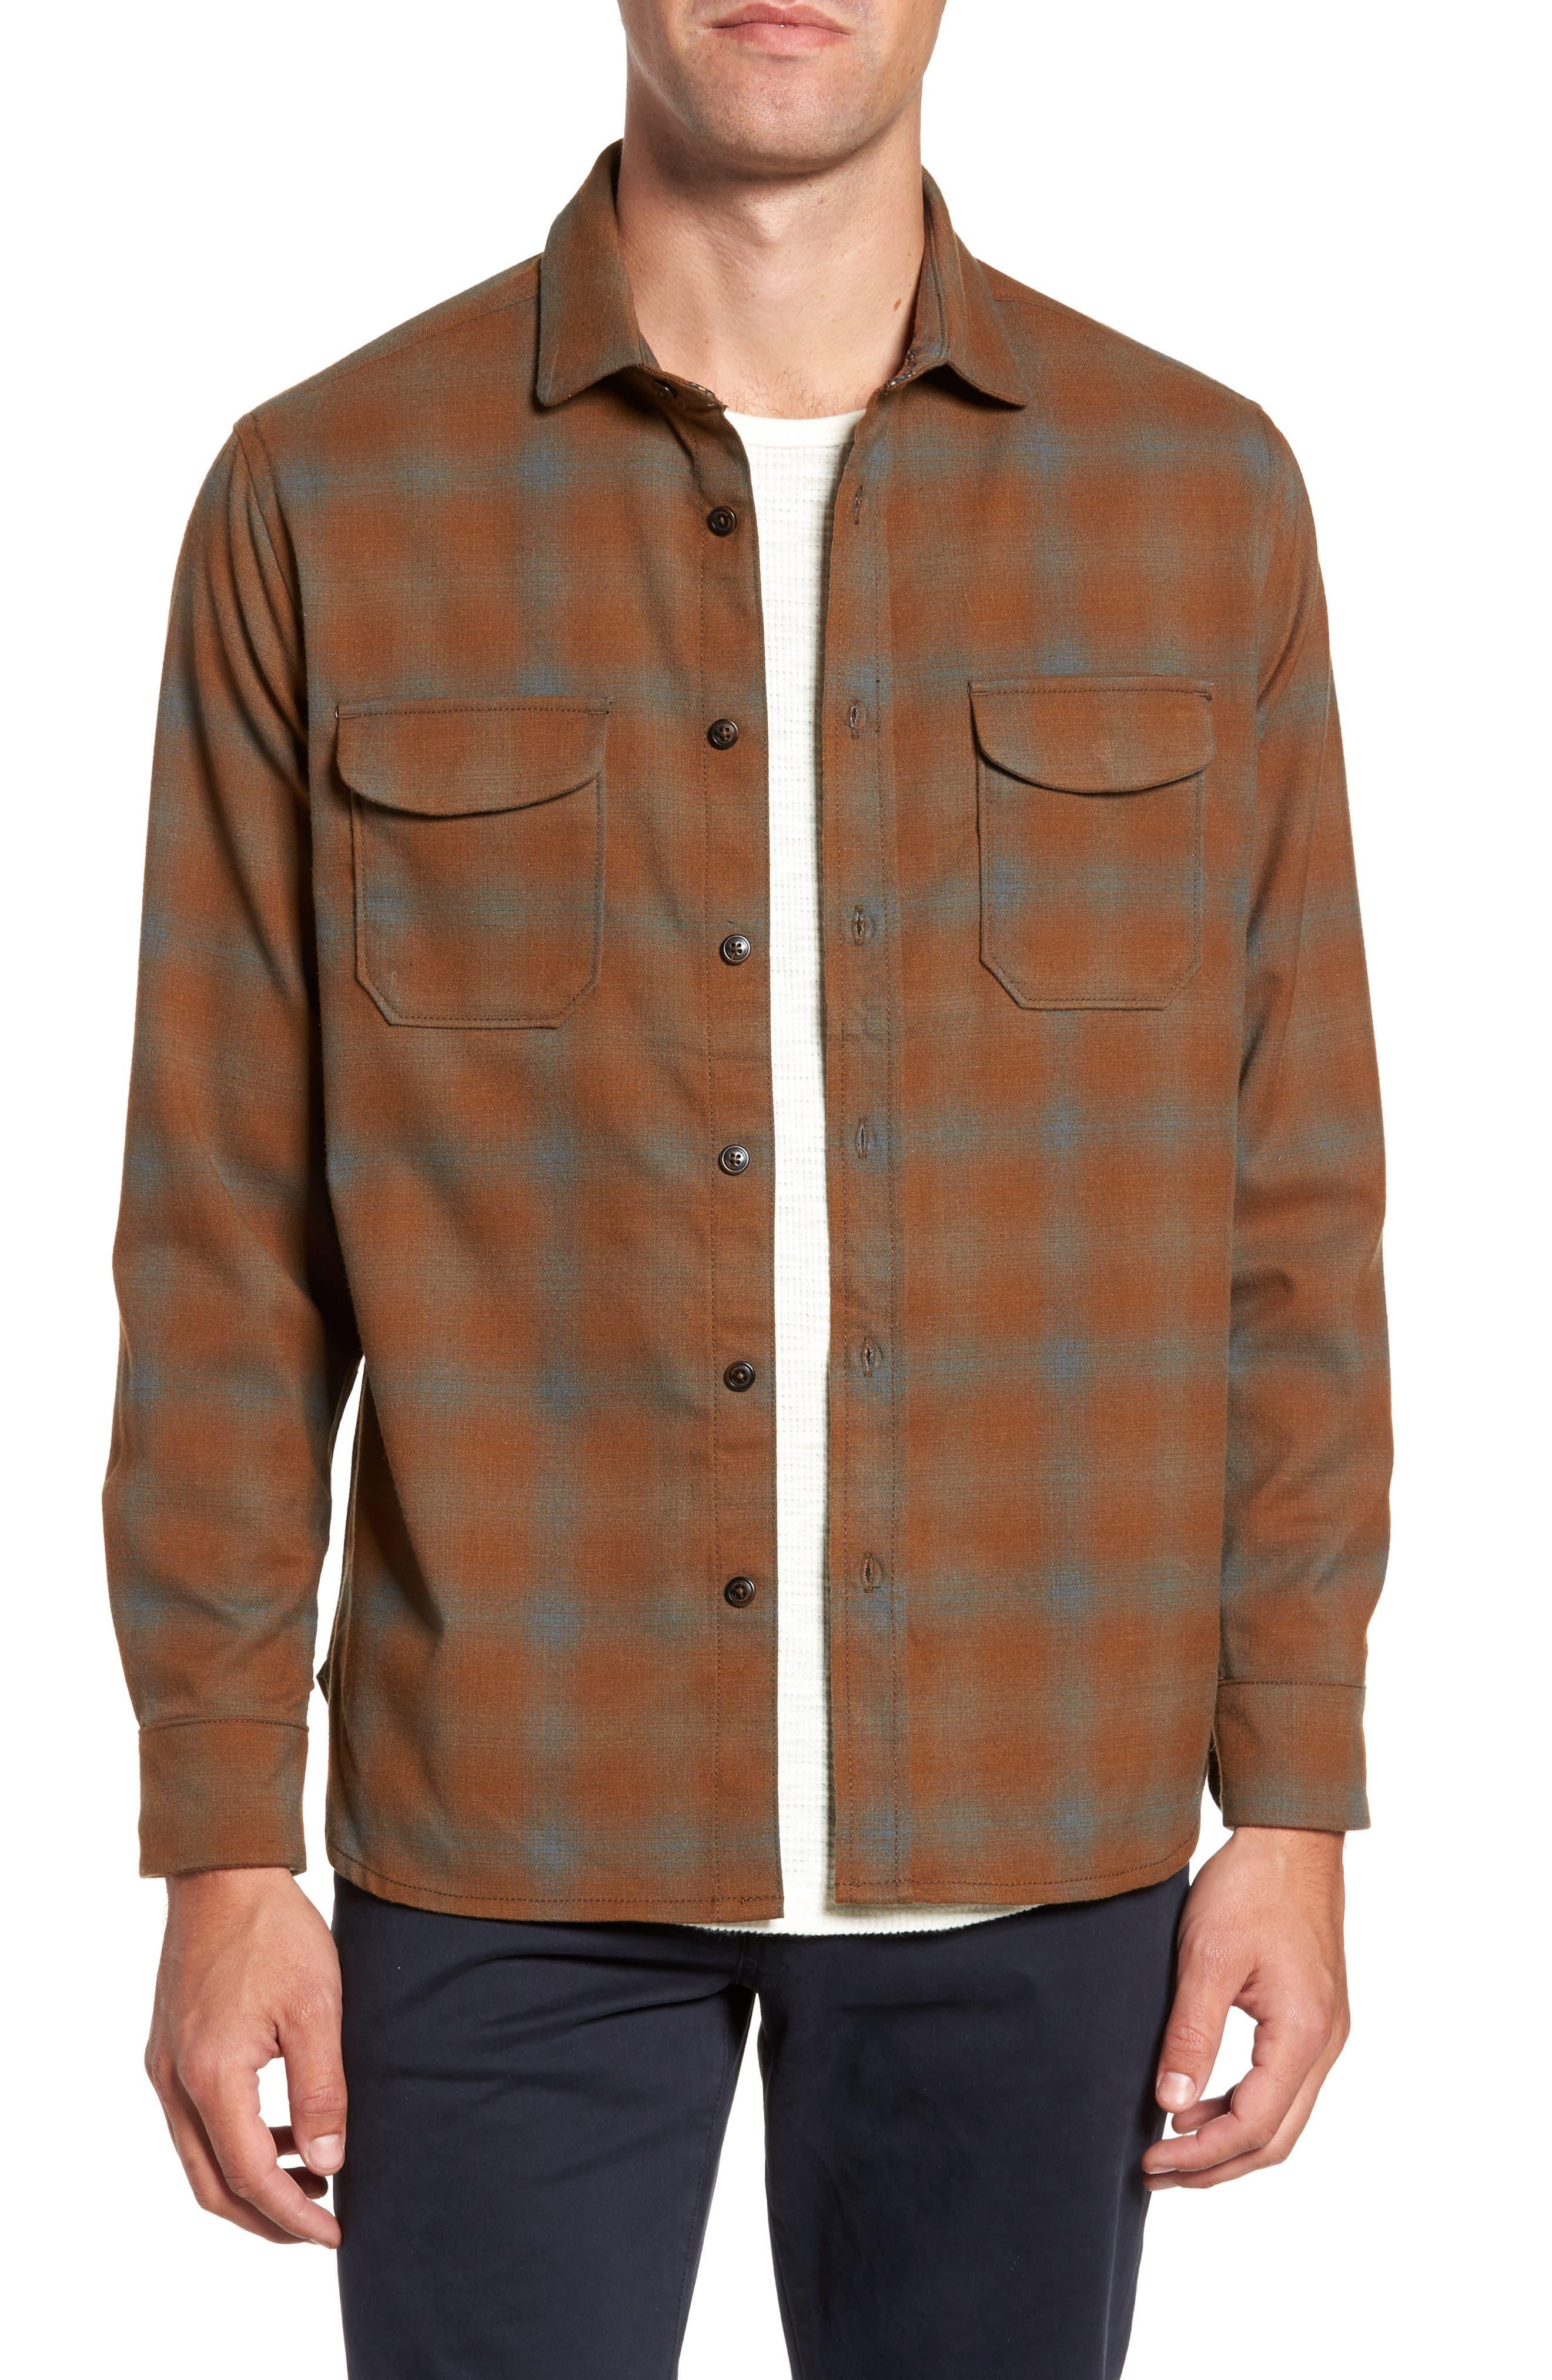 Peak Flannel Sport Shirt,                             Main thumbnail 1, color,                             215